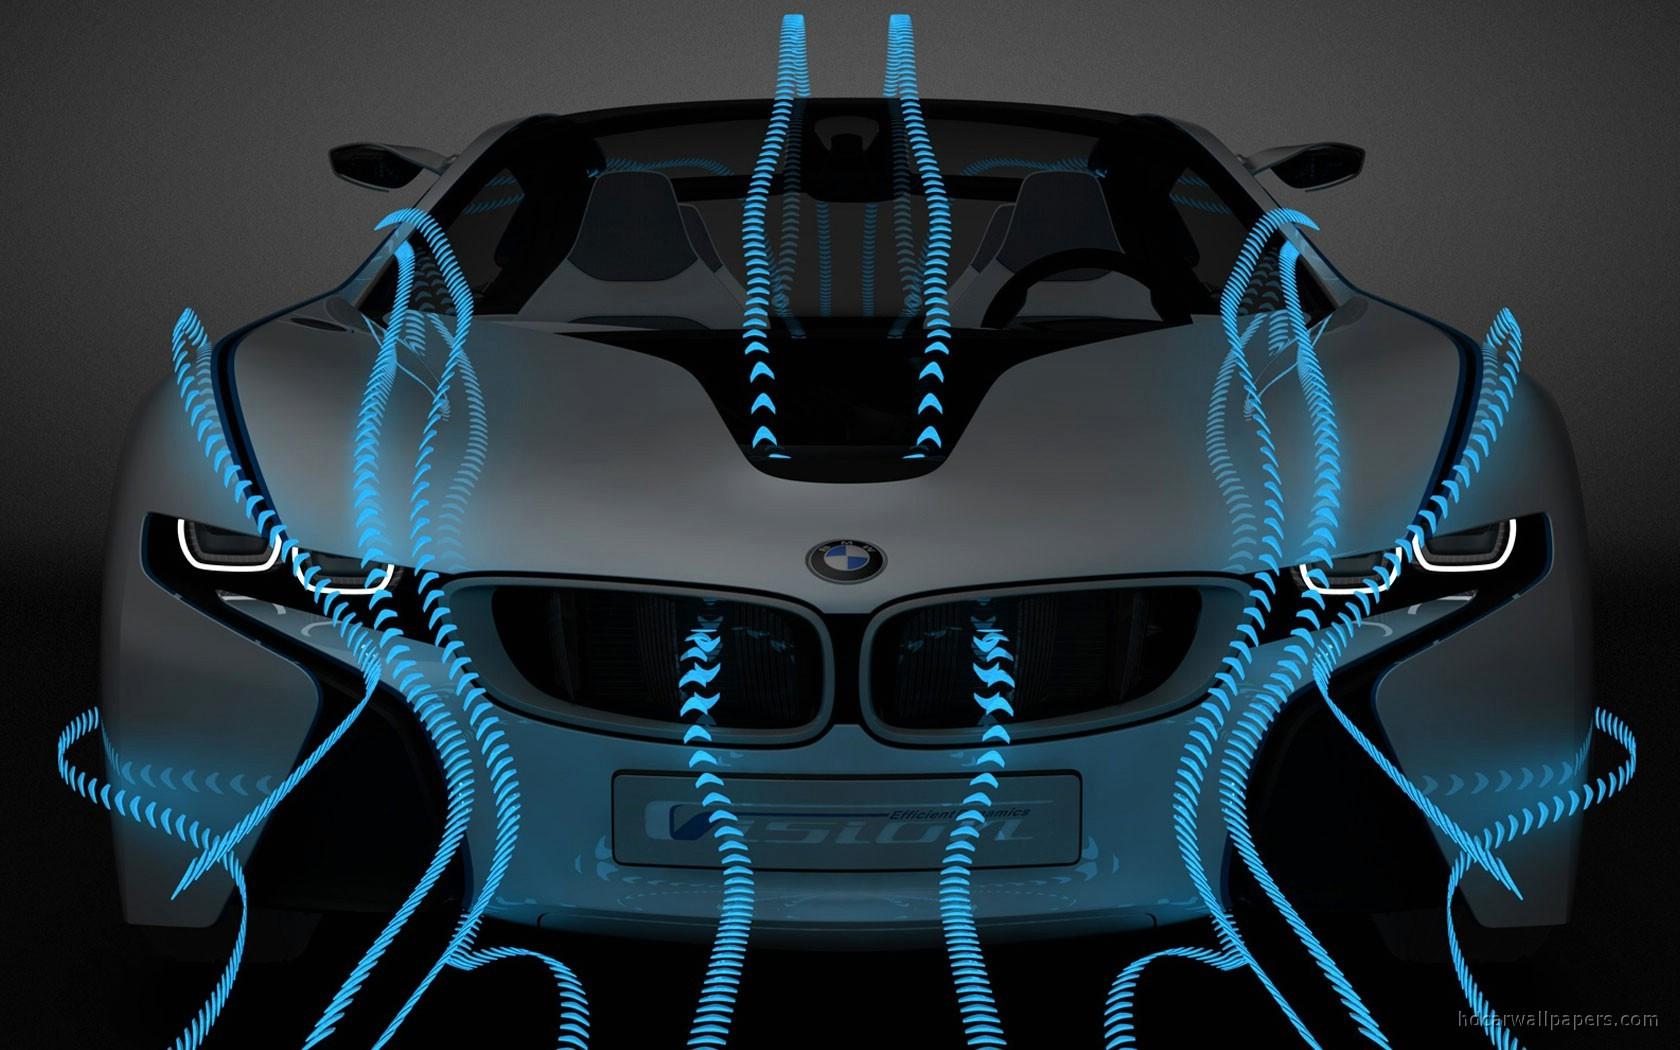 General 1680x1050 BMW i8 BMW vehicle digital art BMW Vision Hybrid silver cars concept cars